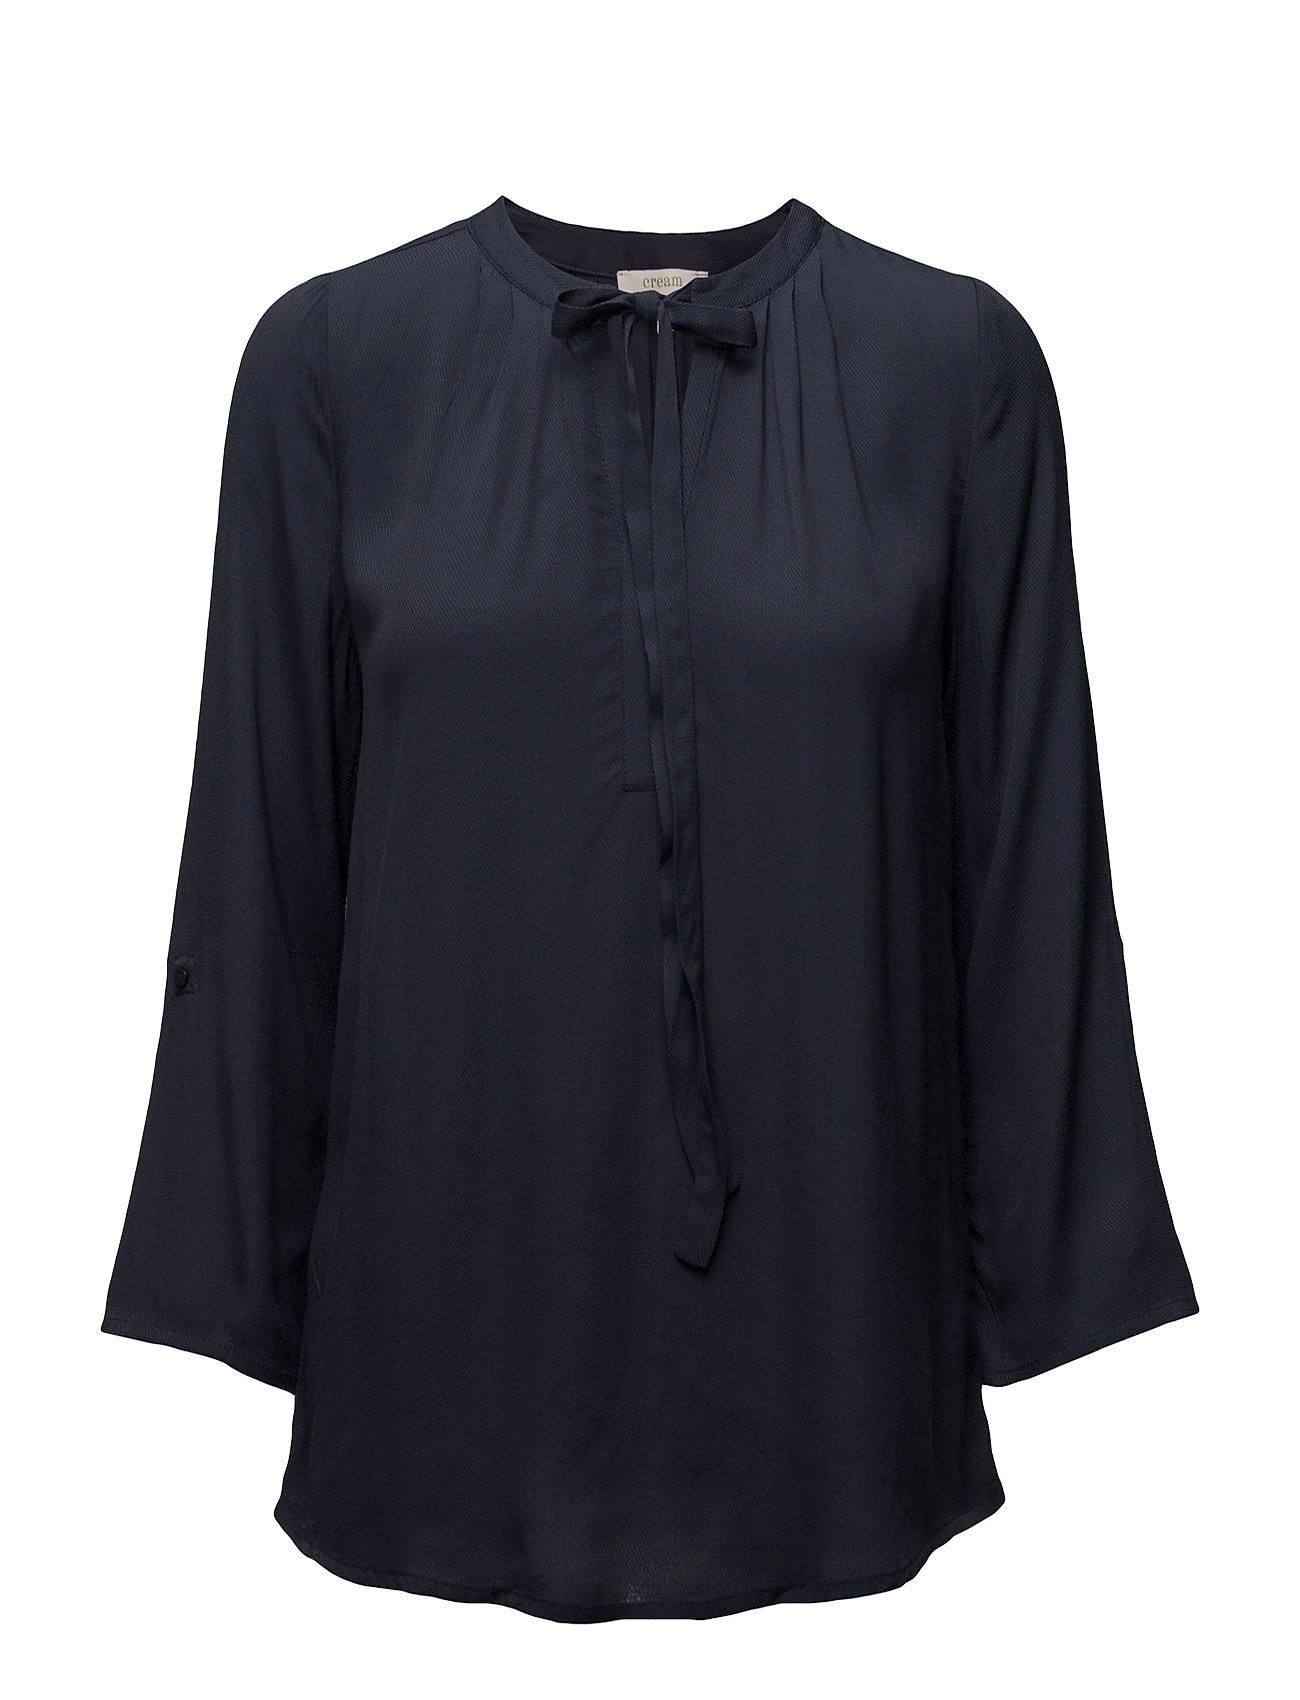 Cream Vera 3/4 sleeve blouse - ROYAL NAVY BLUE